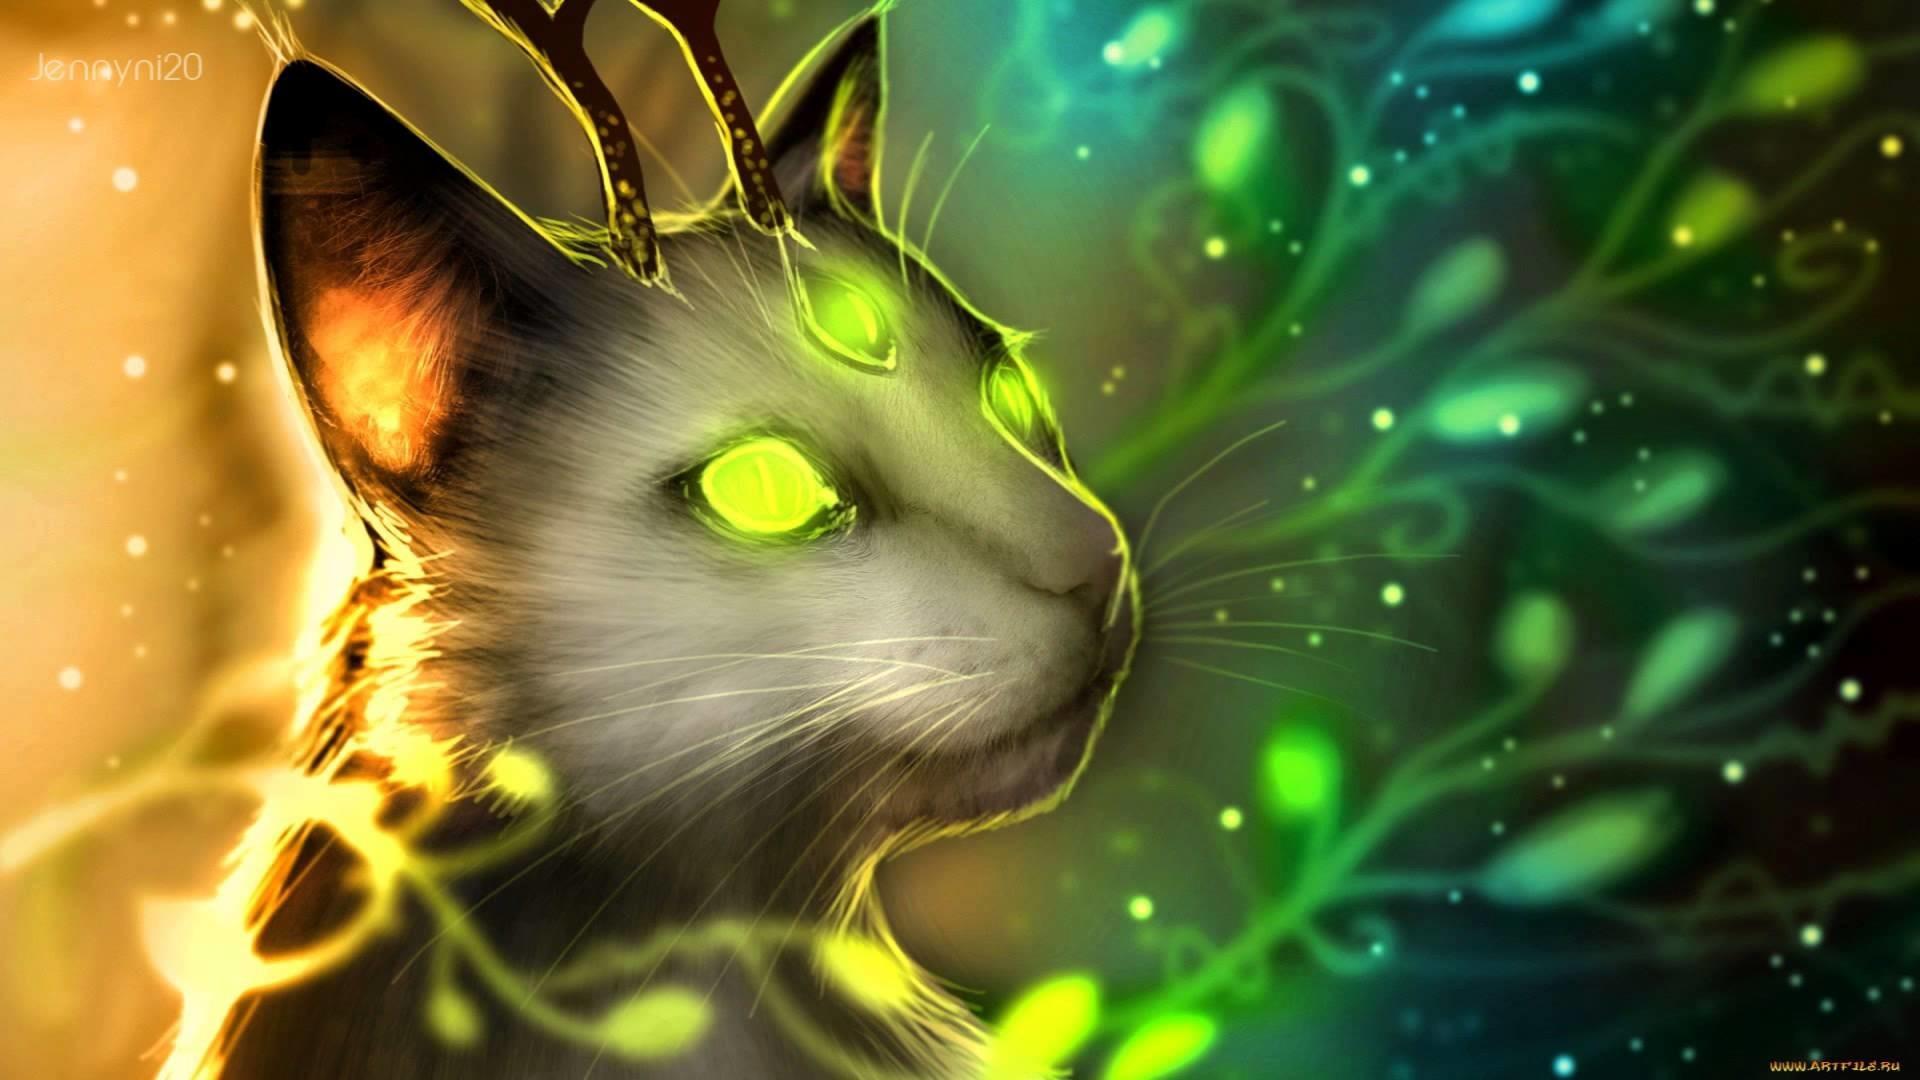 Epic Cat Wallpaper 73 Images